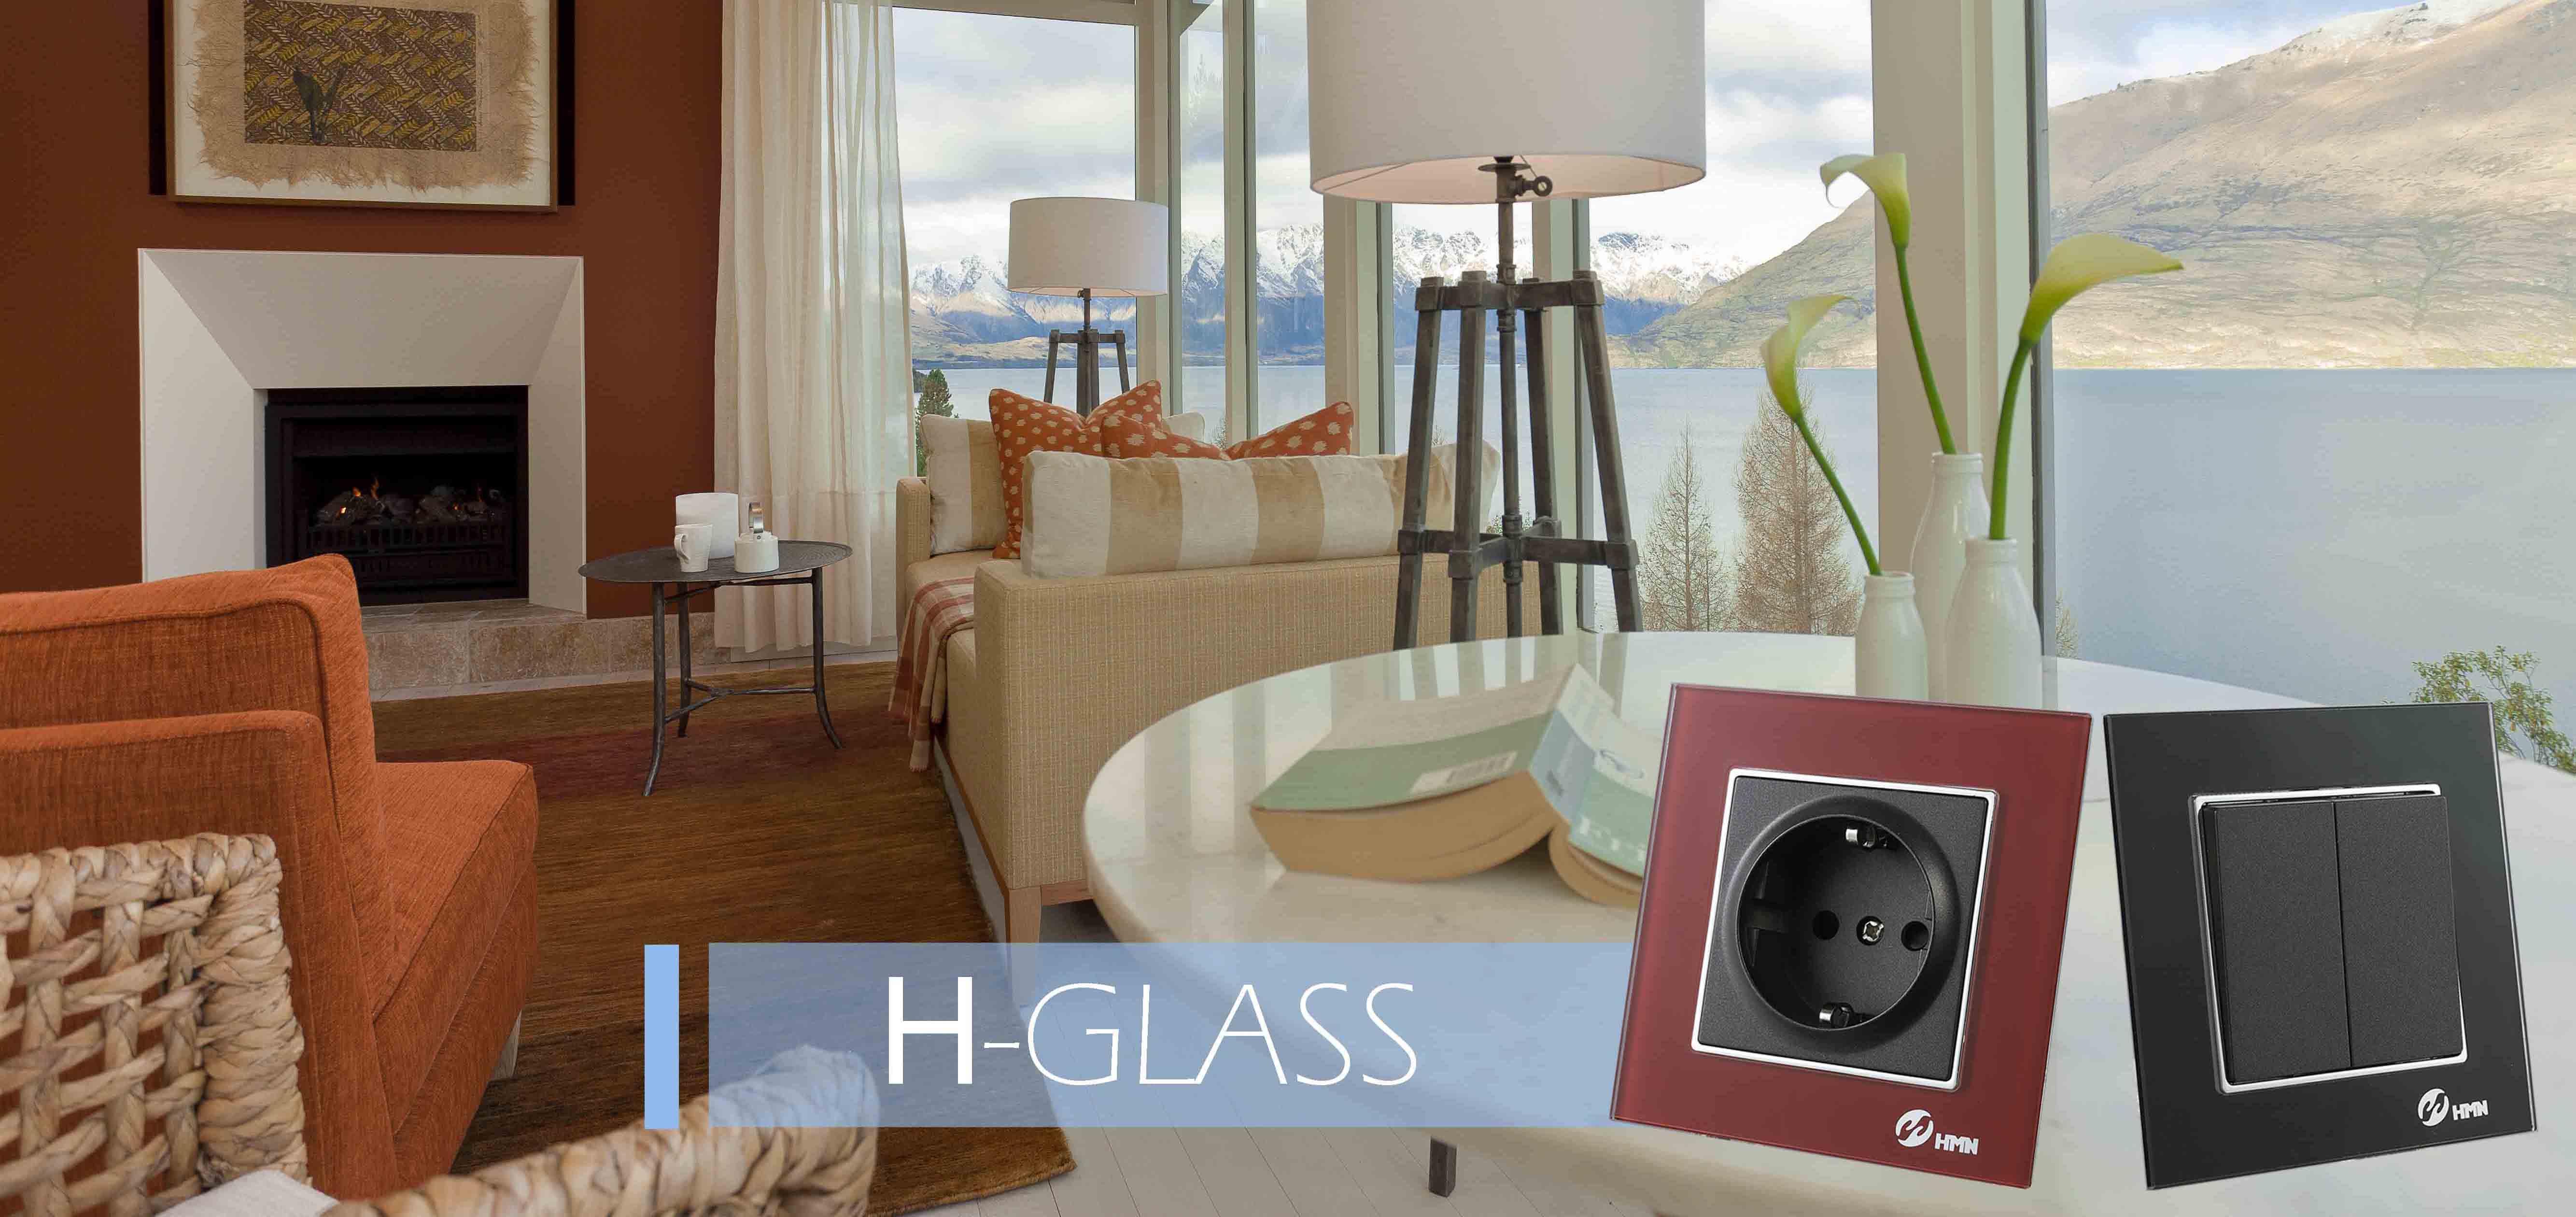 H-Glass series